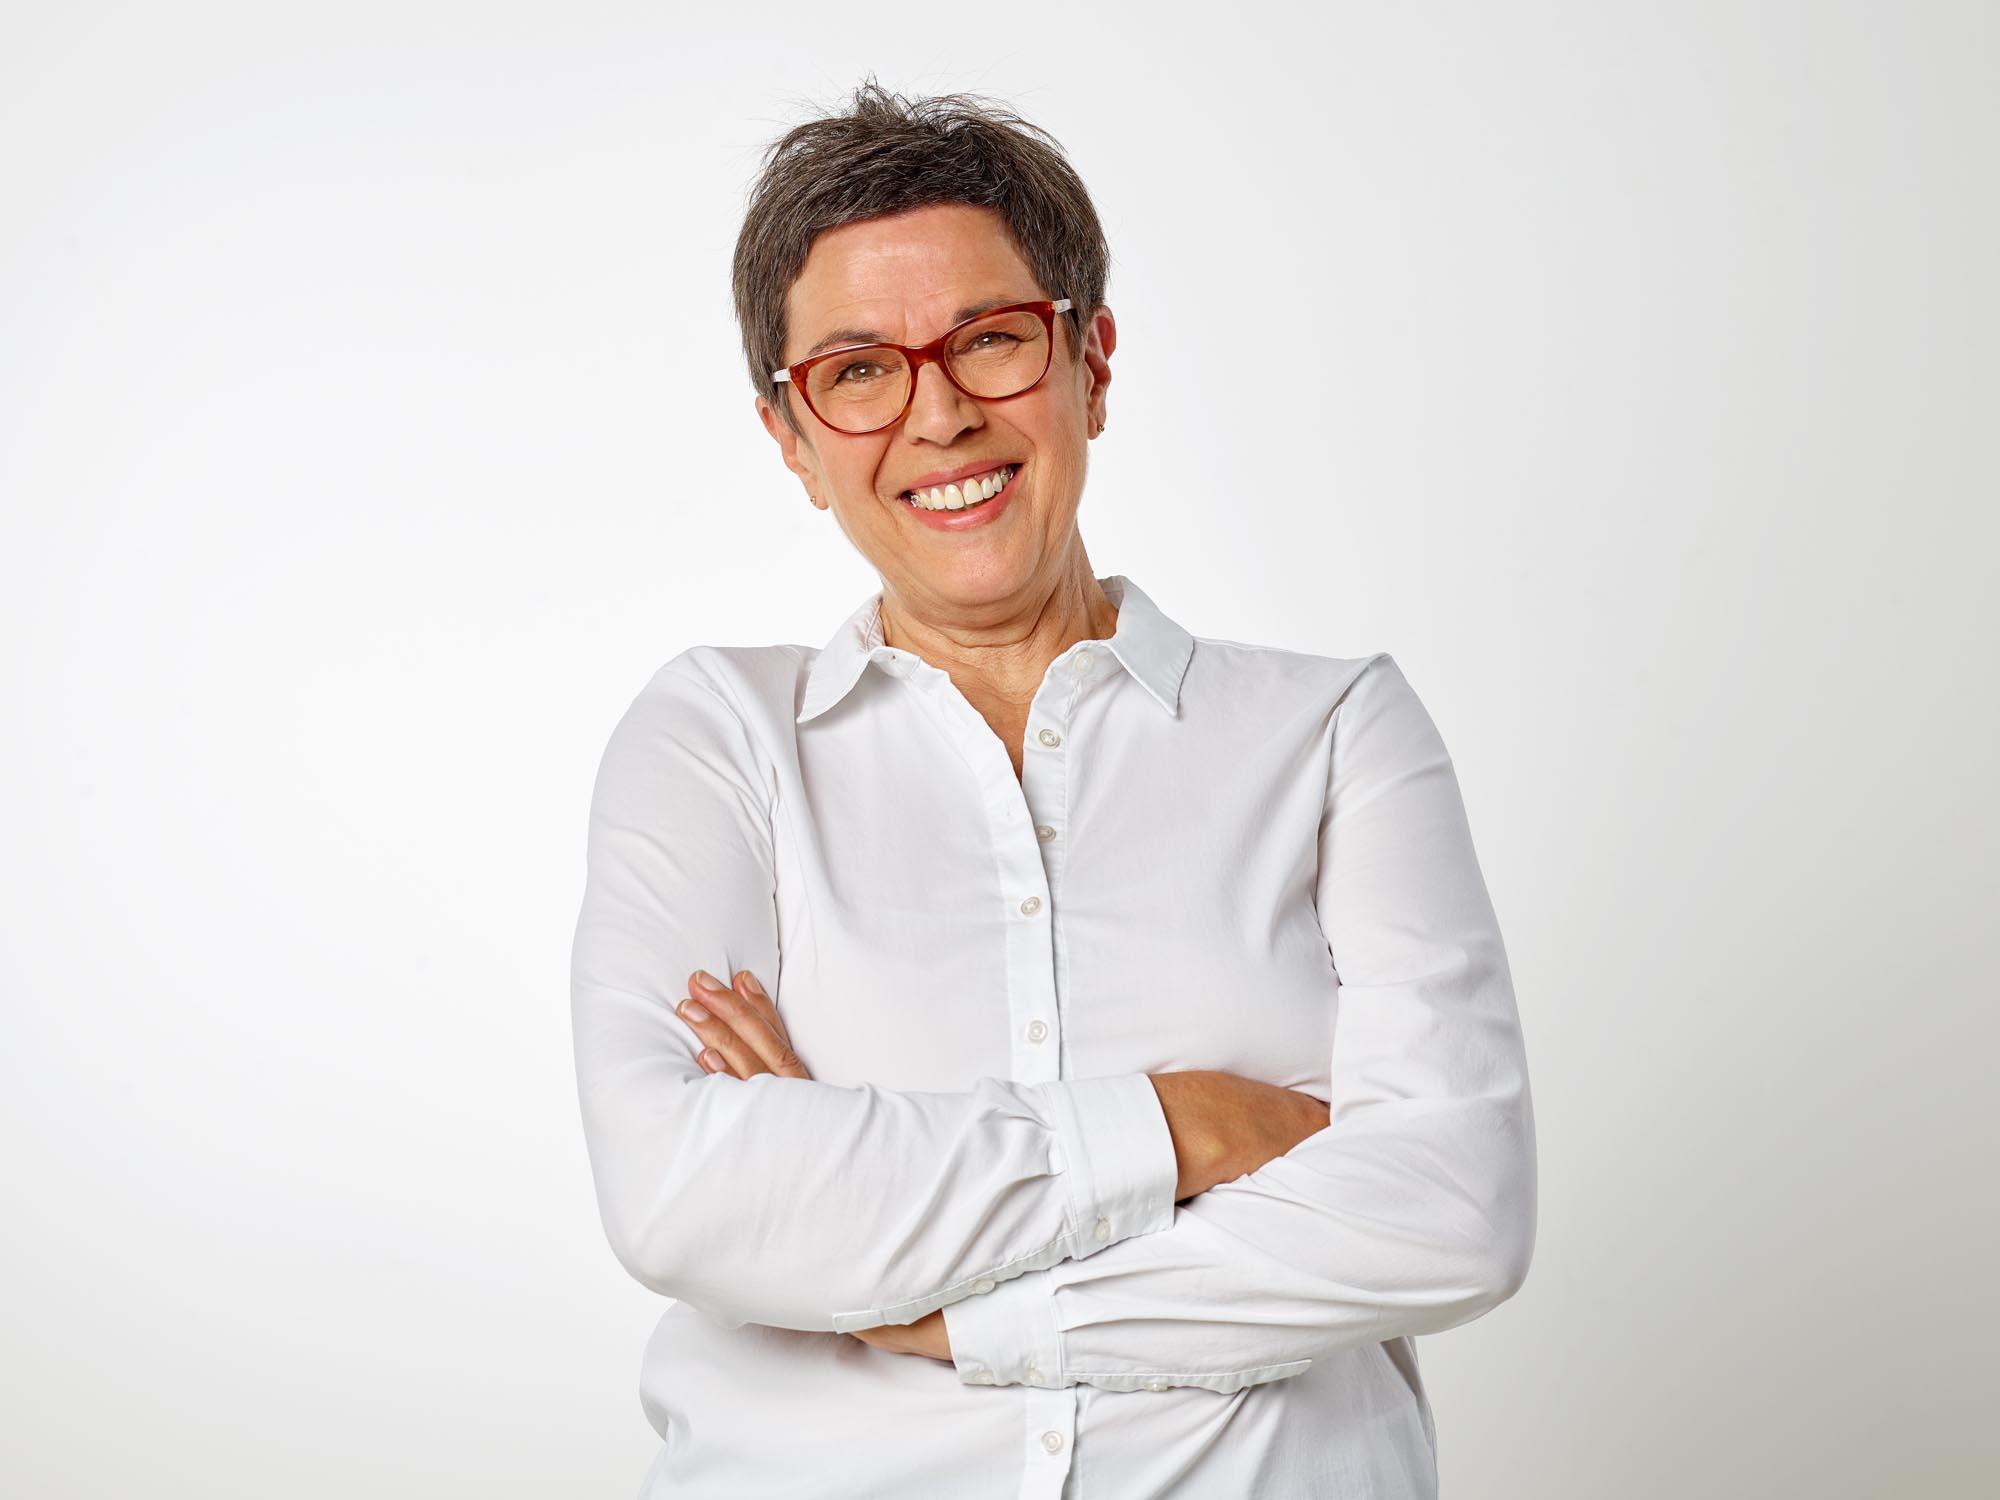 Klara Fischer